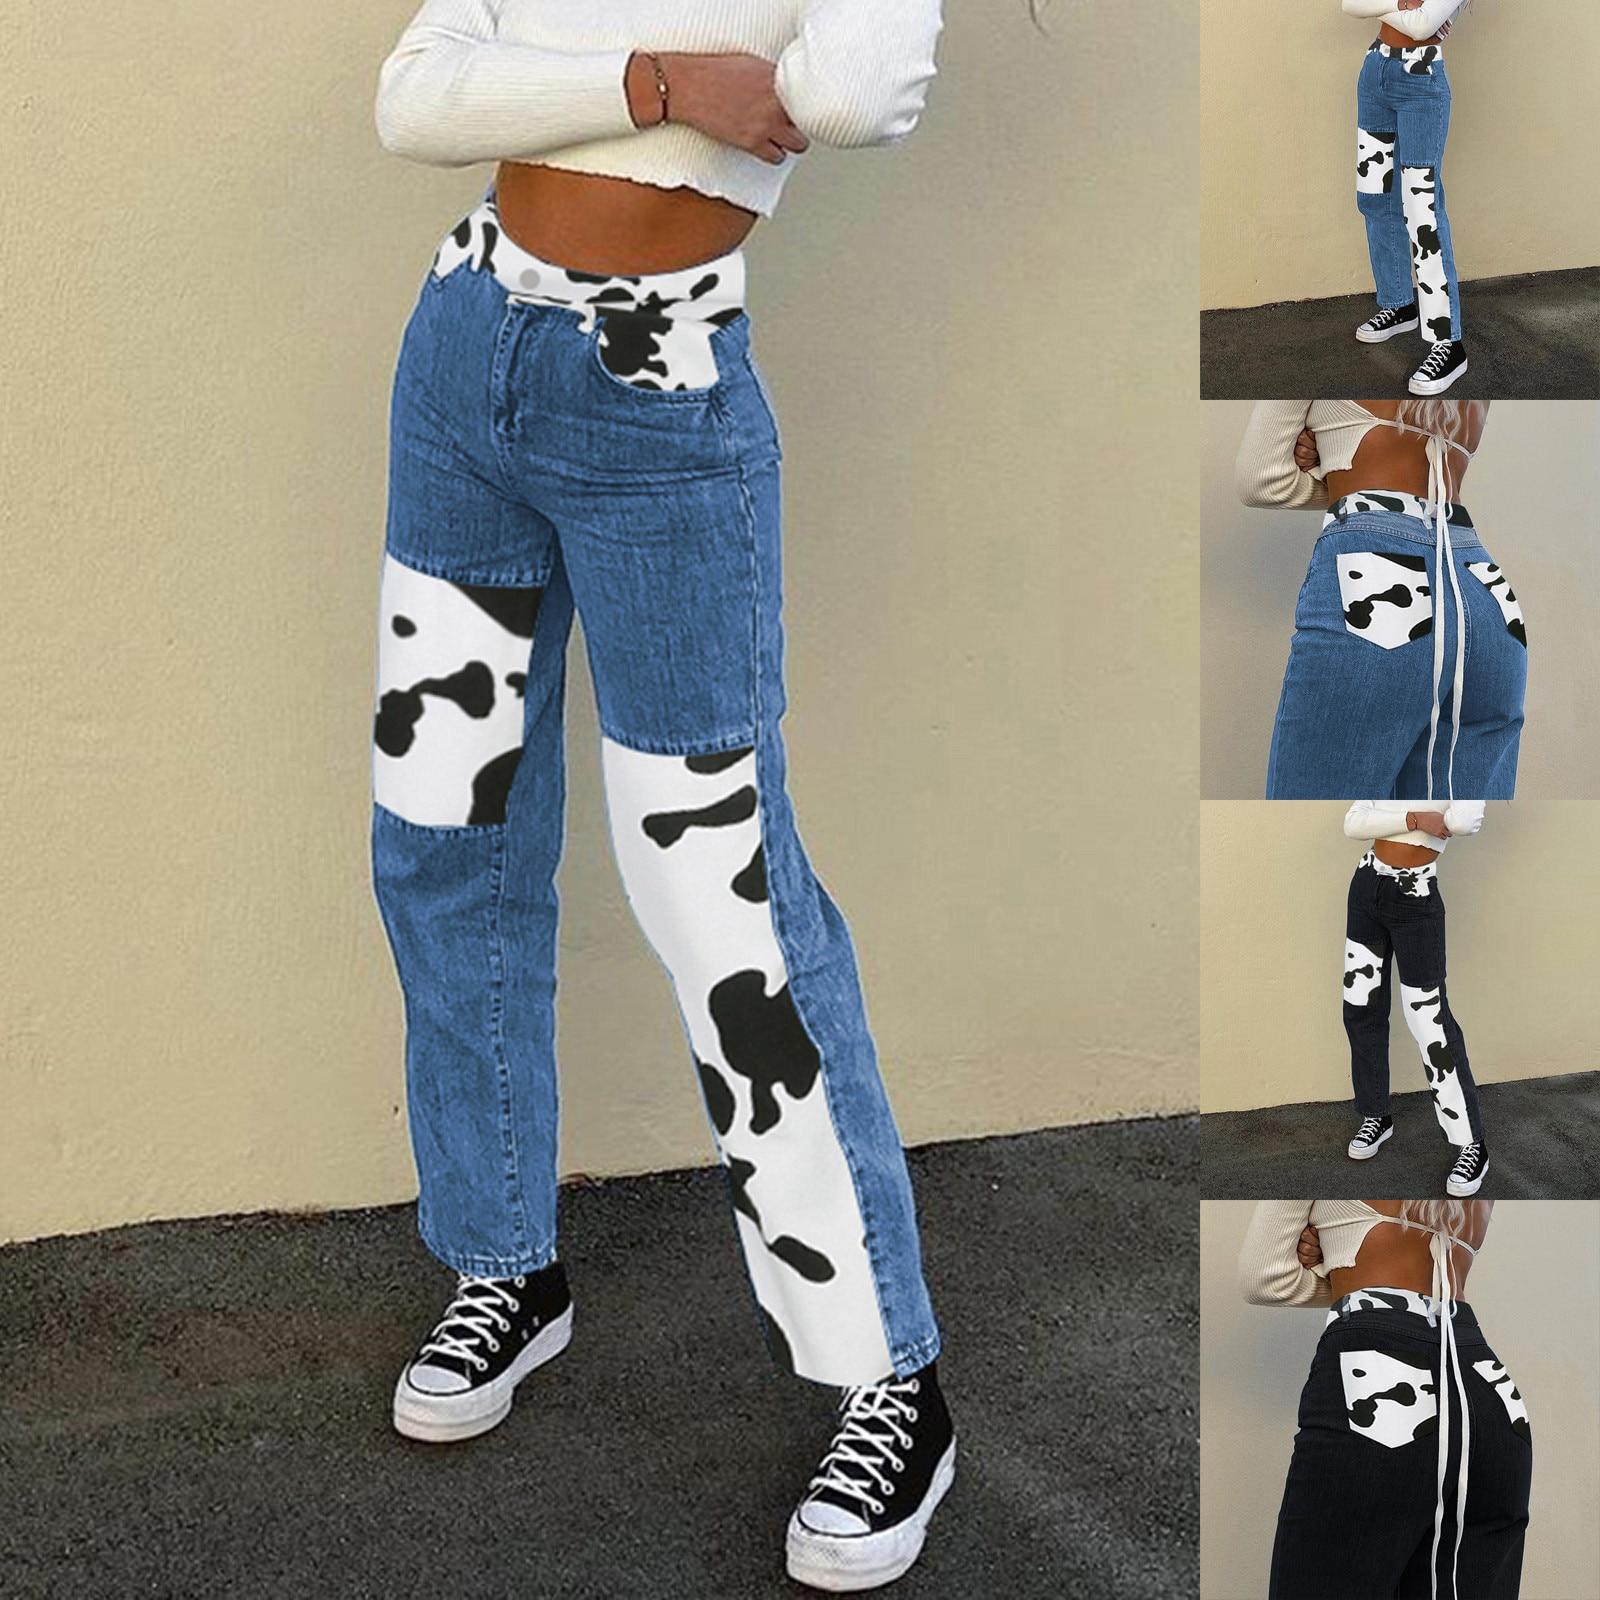 Frauen Gerade Hosen Passenden Farbe Jeans Hohe Taille Dünne Lose Kuh Gedruckt Passenden Farbe block Mode Schlanke Hosen D15